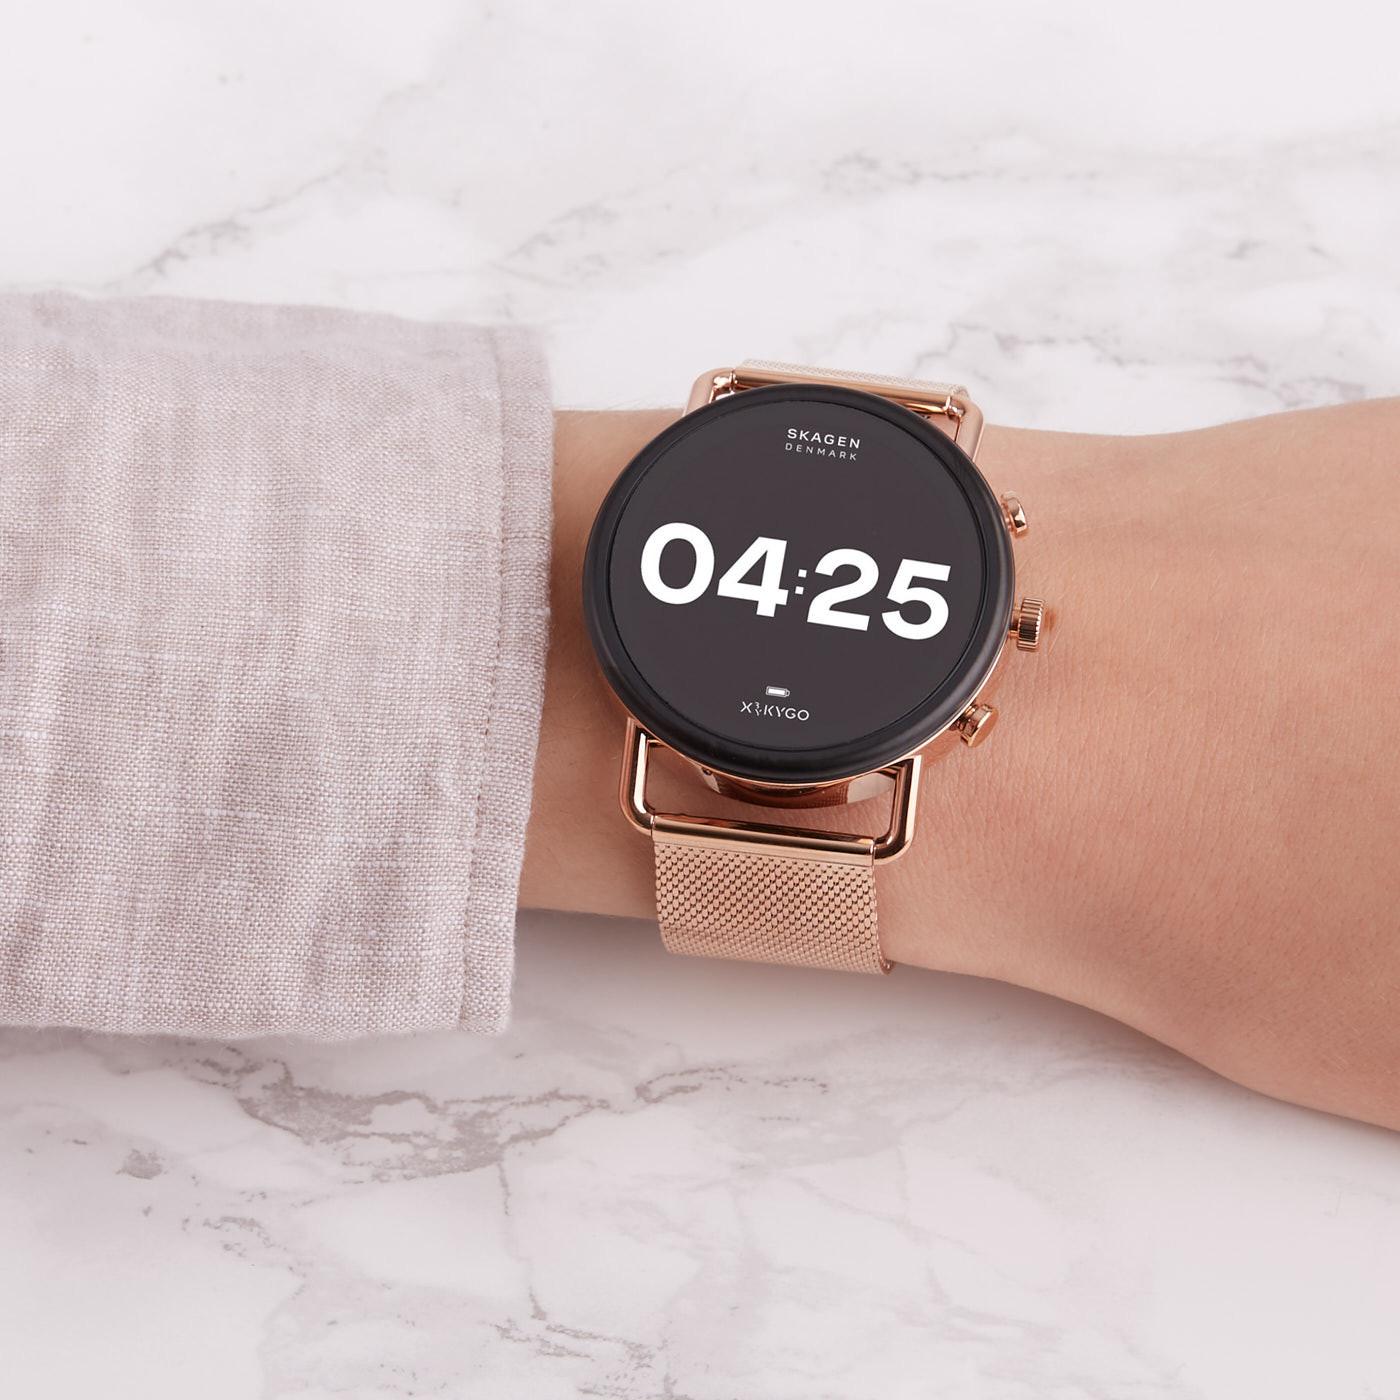 Skagen Falster 3 Gen 5 Display Smartwatch SKT5204